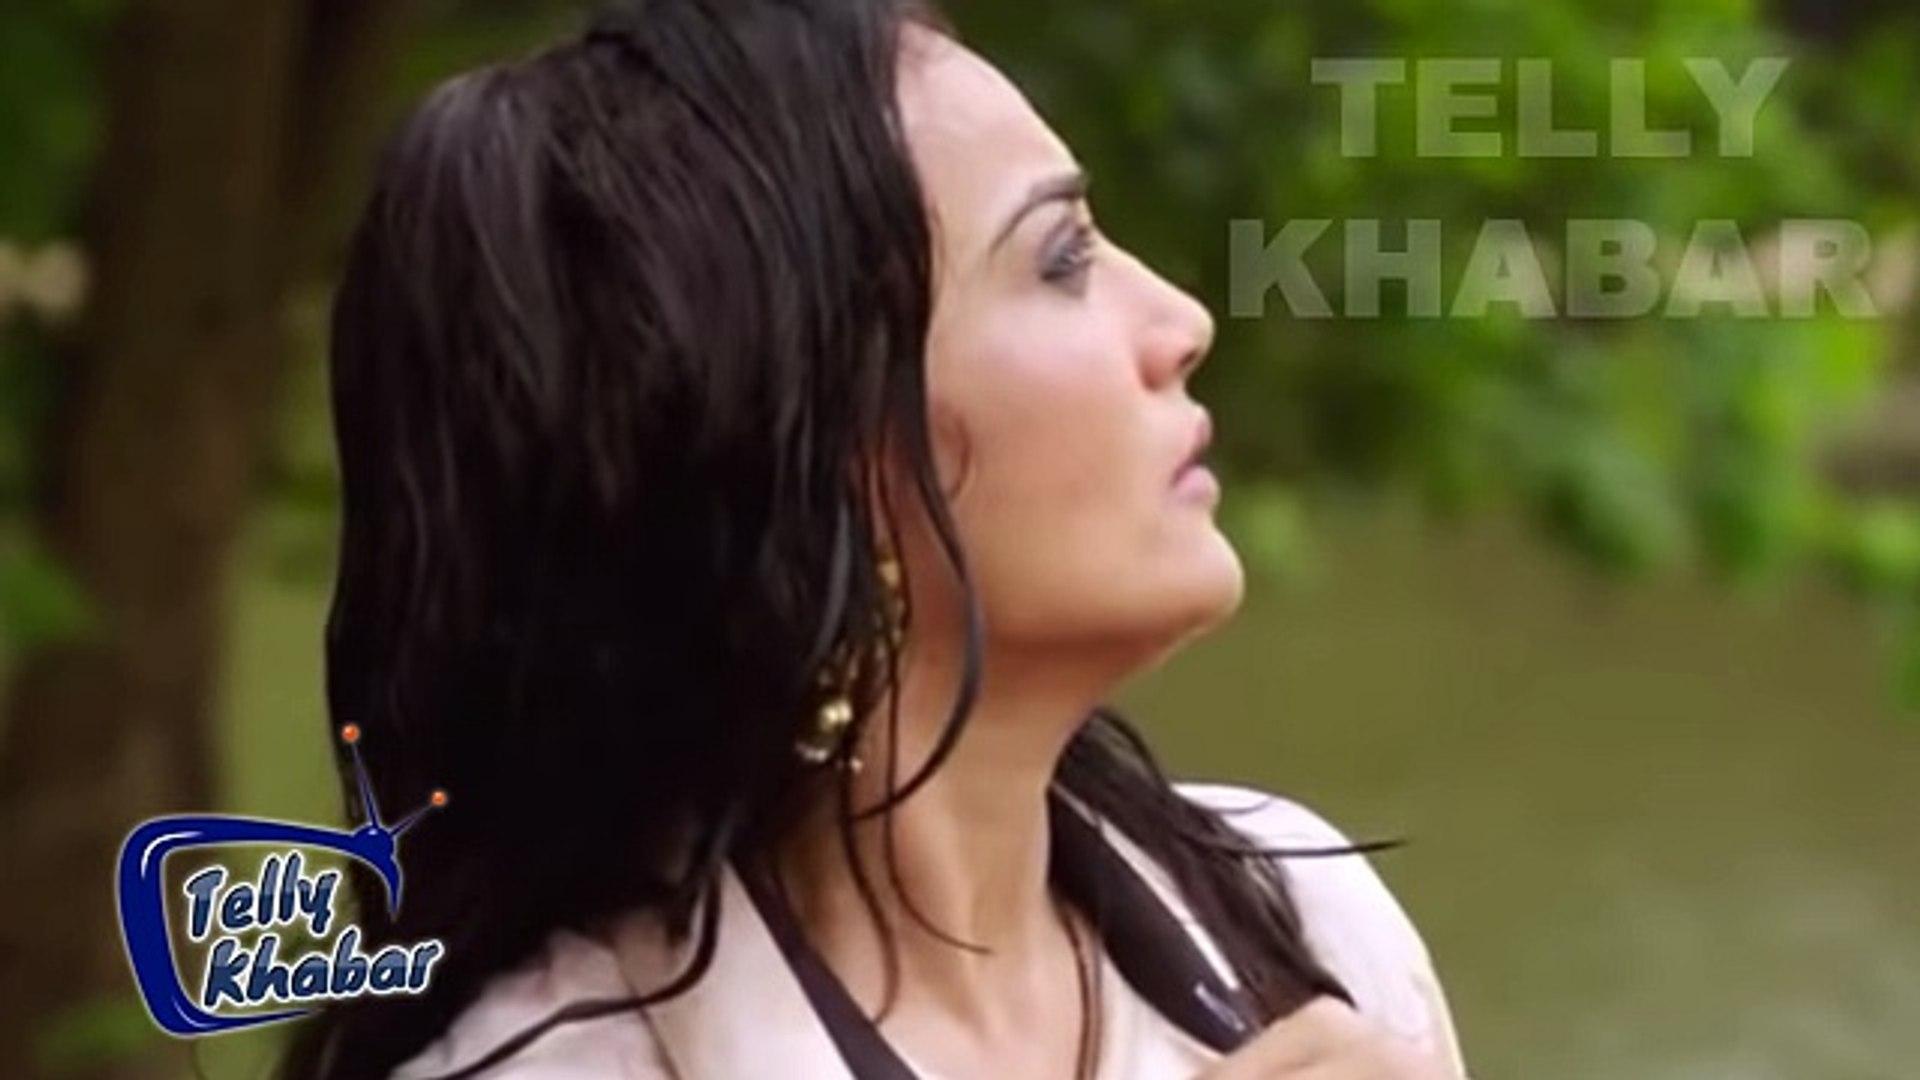 Naagin 3 - 29th July 2018 - Today Hindi Serial News - Colors Tv Naagin  Season 3 News 2018 -